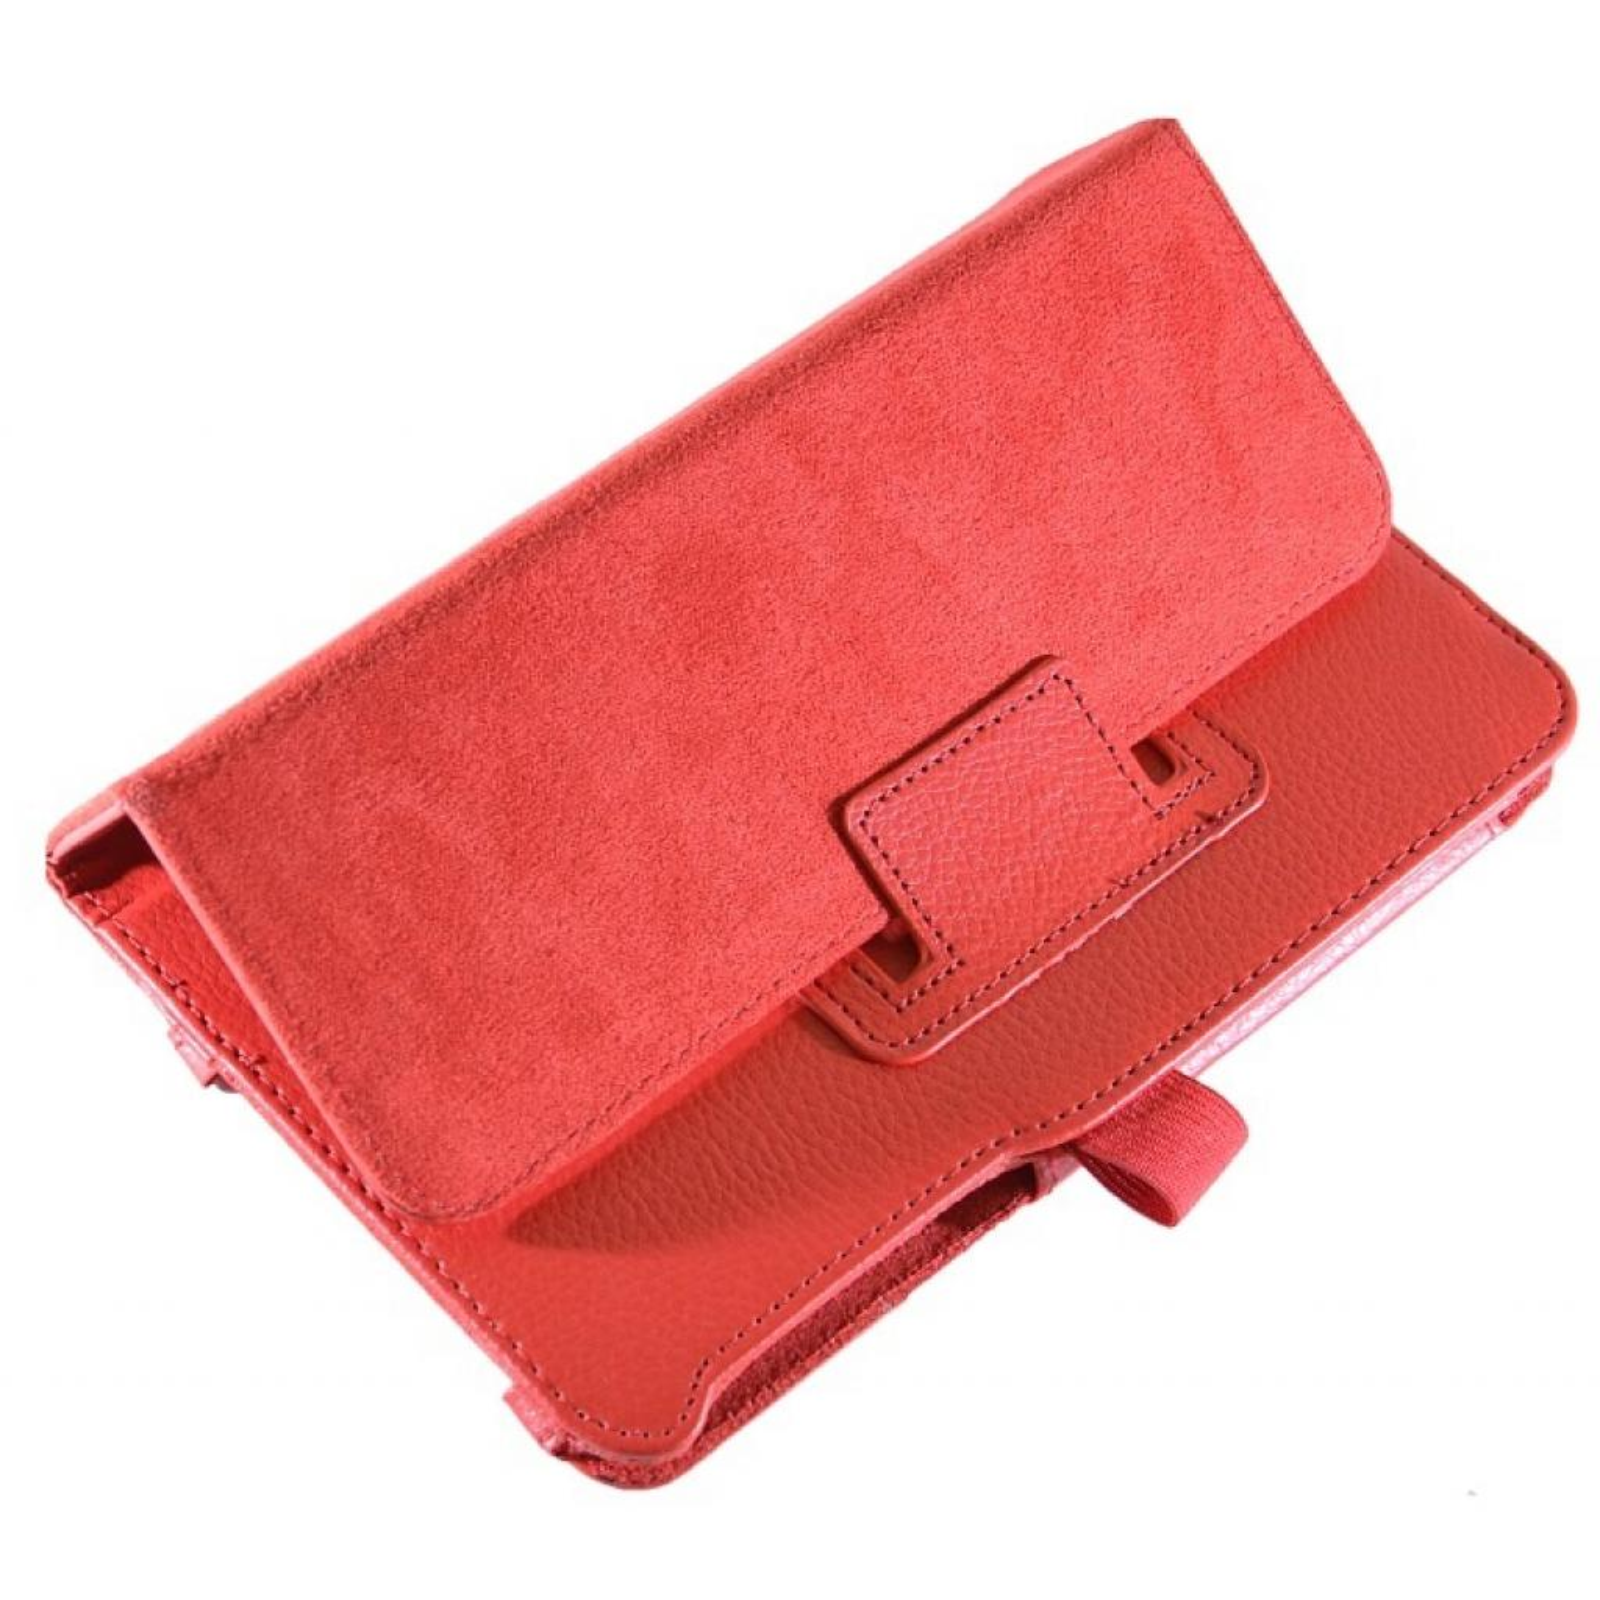 "Чехол для планшета Pro-case 7"" Asus MeMO Pad ME170 red (ME170r) изображение 3"